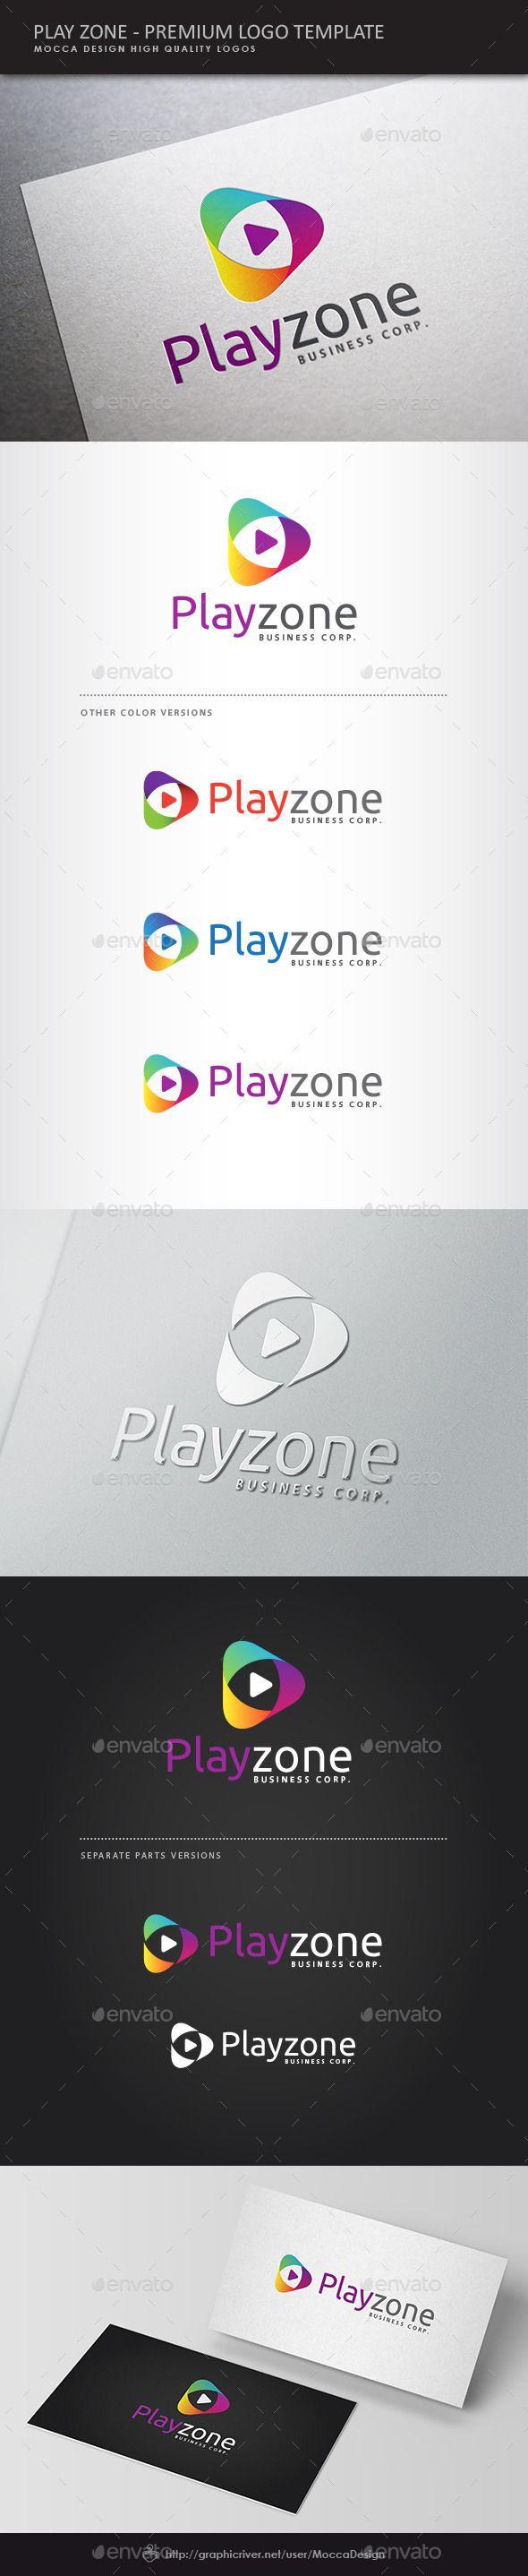 Play Zone Logo Template Vector EPS, AI Illustrator. Download here: https://graphicriver.net/item/play-zone-logo/10706964?ref=ksioks